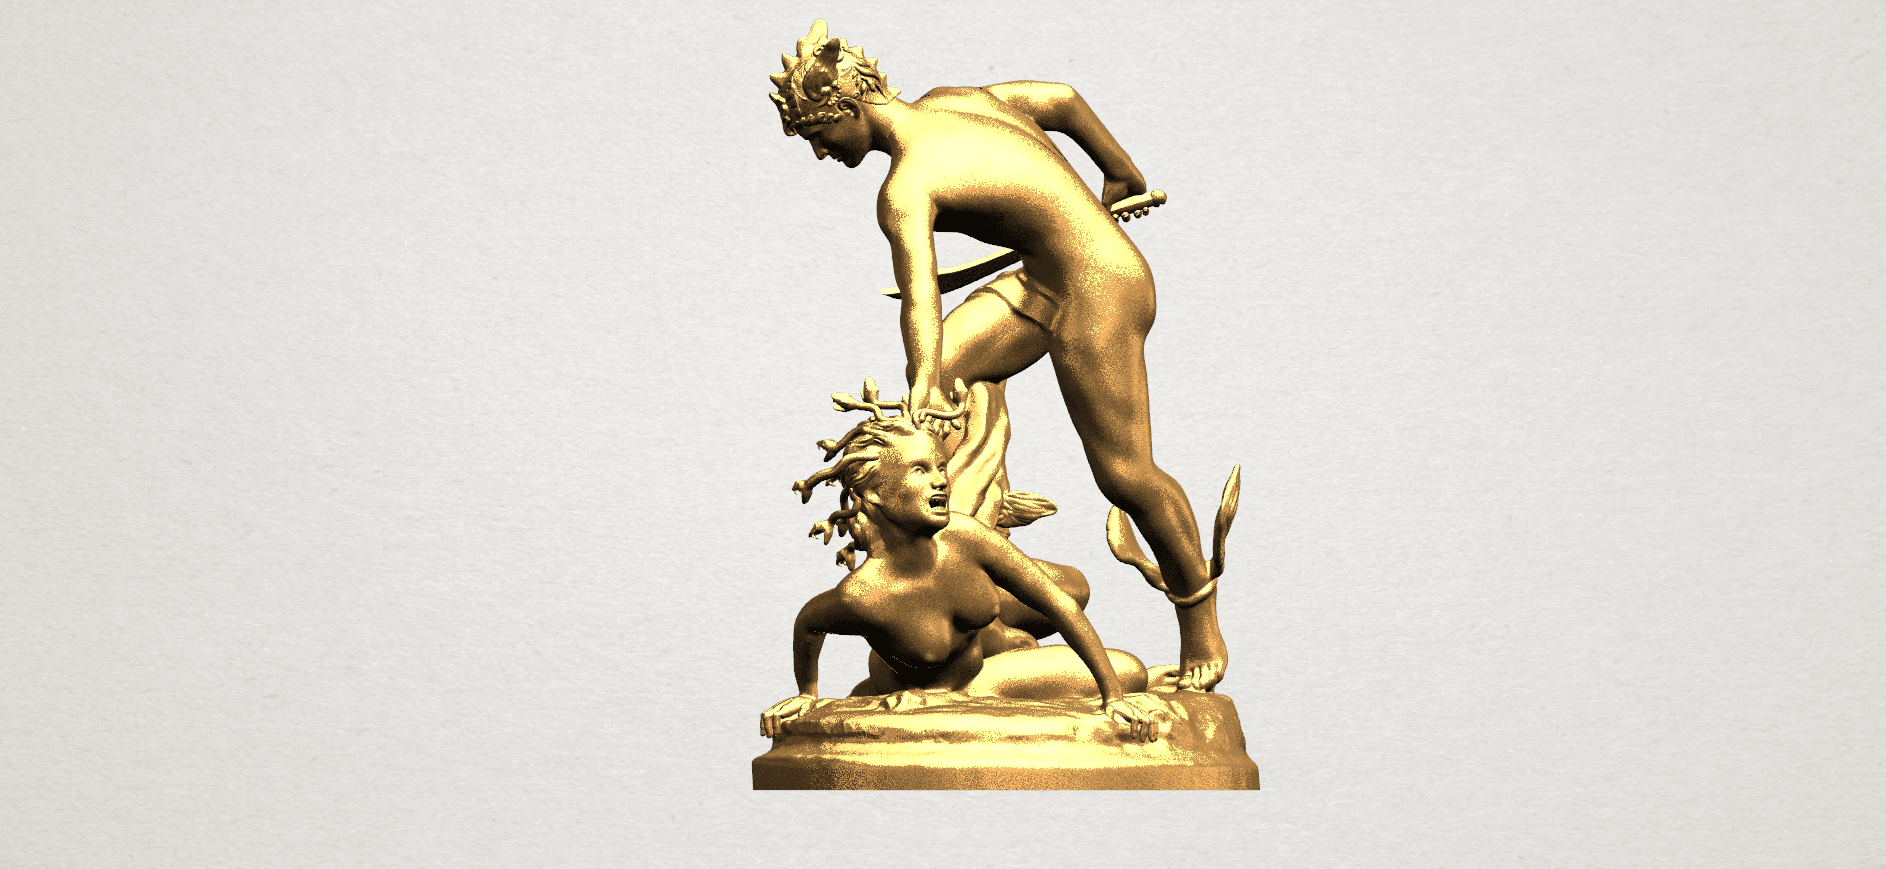 Killing - A01.png Download free STL file Killing 01 • 3D printable model, GeorgesNikkei